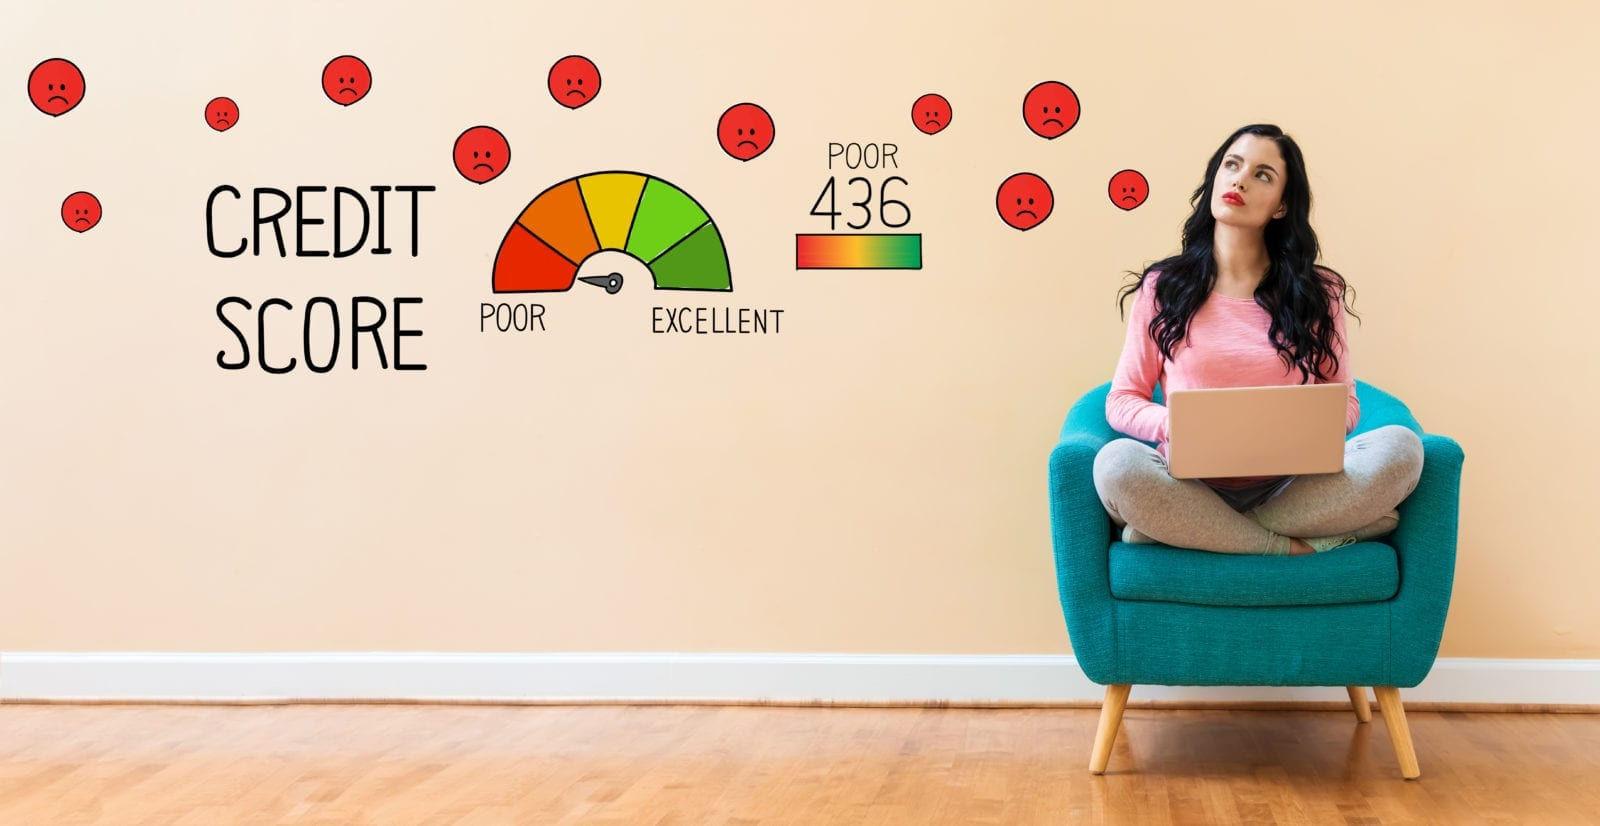 bad credit score image | refused car finance